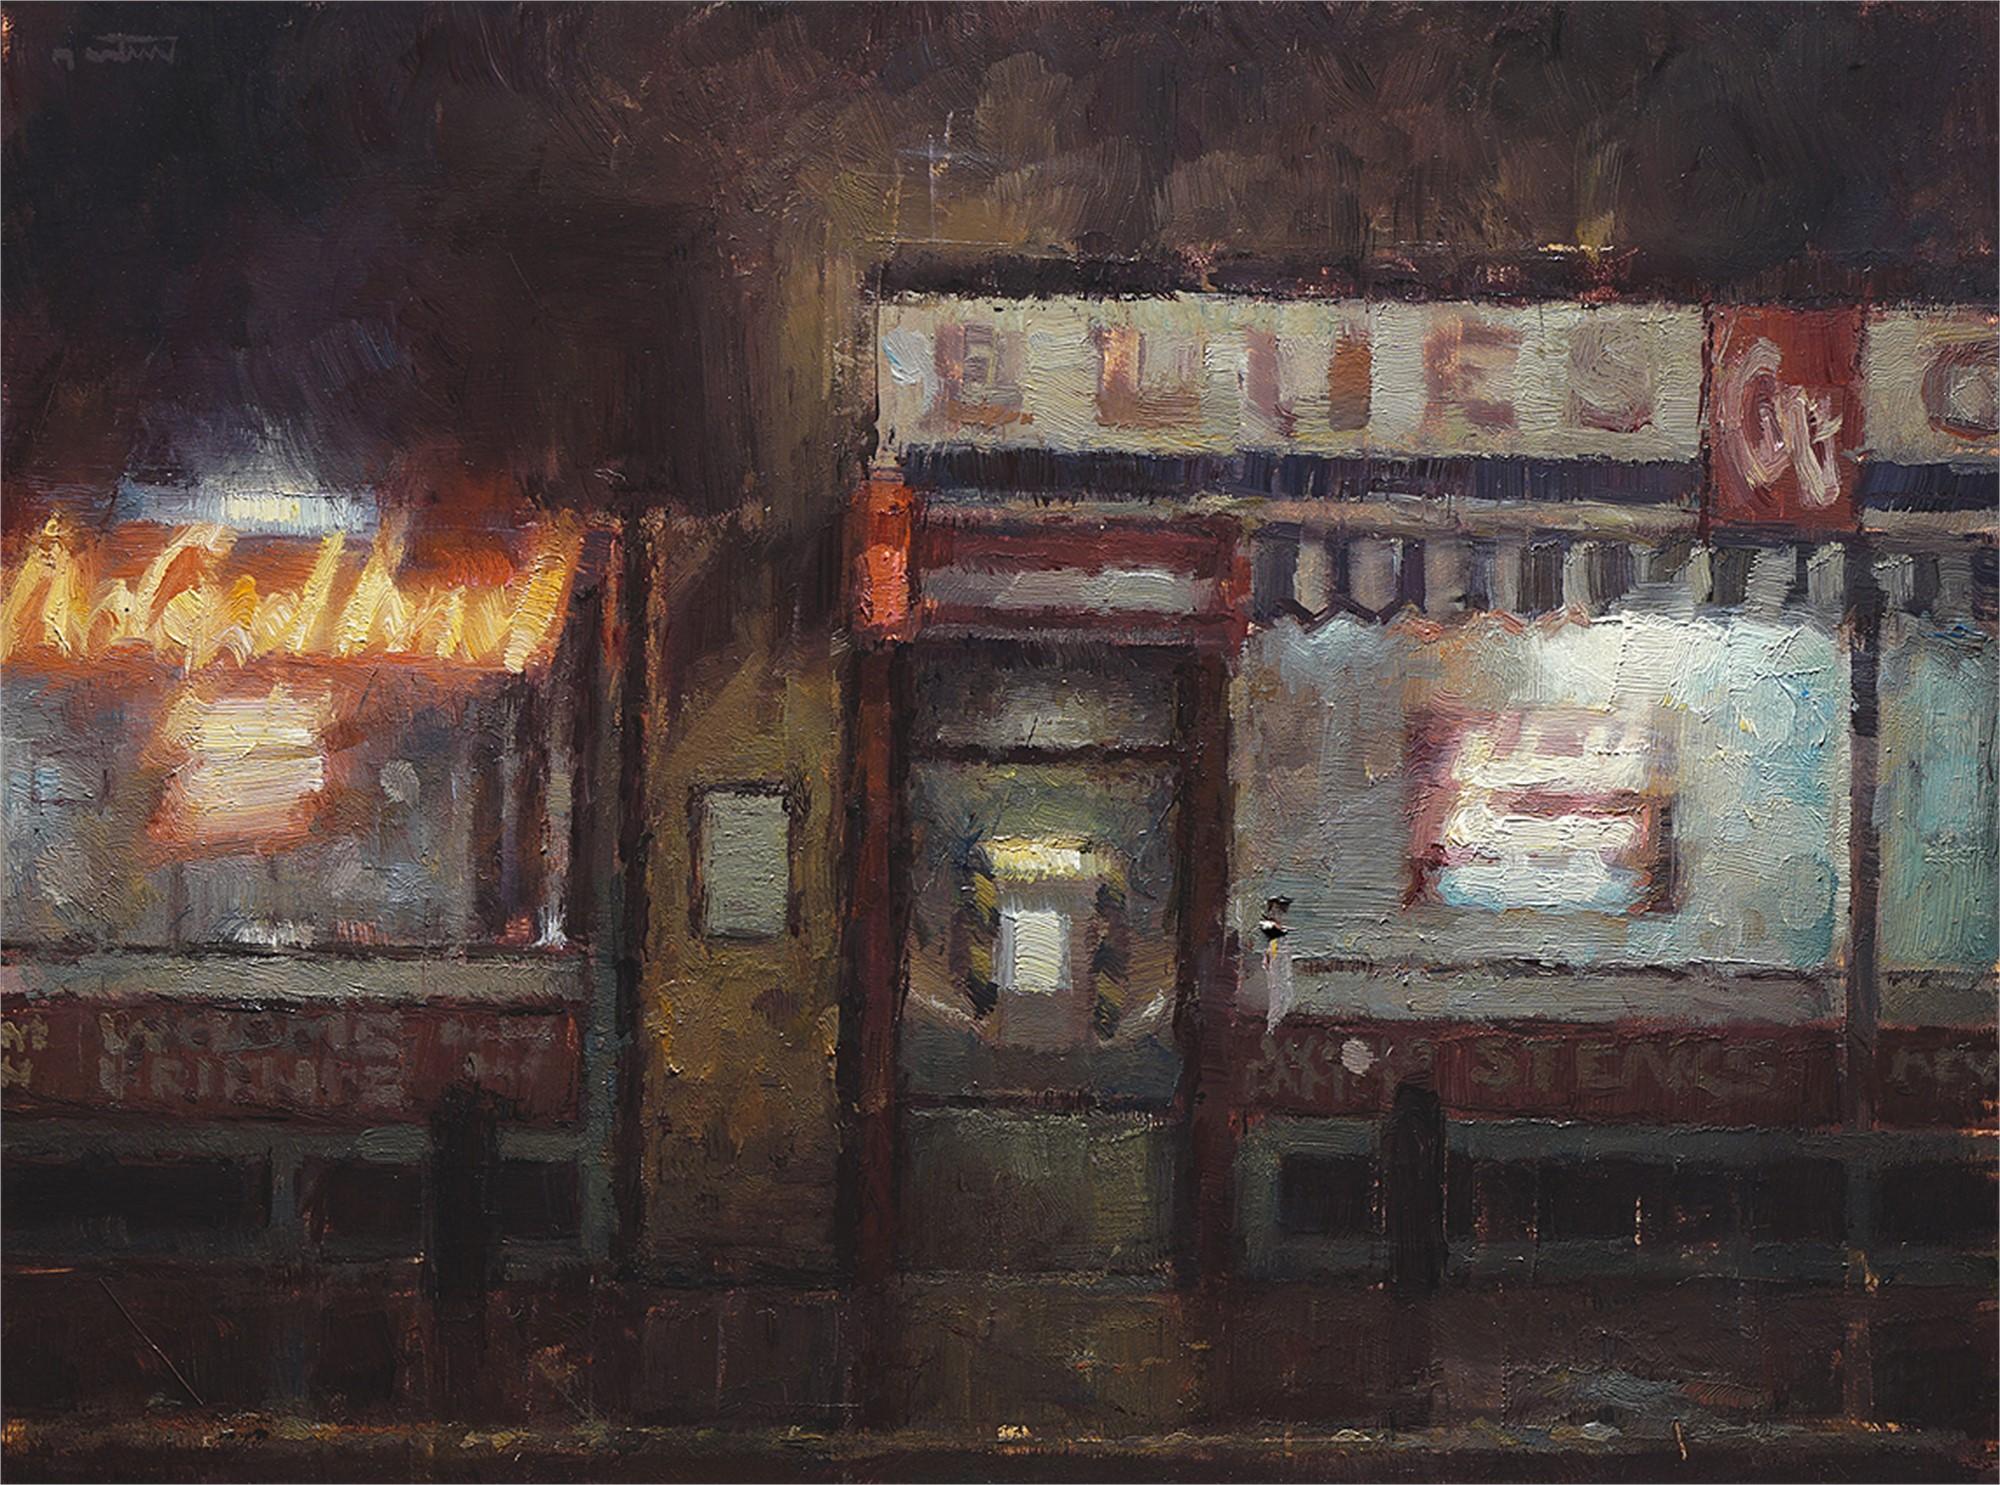 Liquor Store by Nicolas Martin